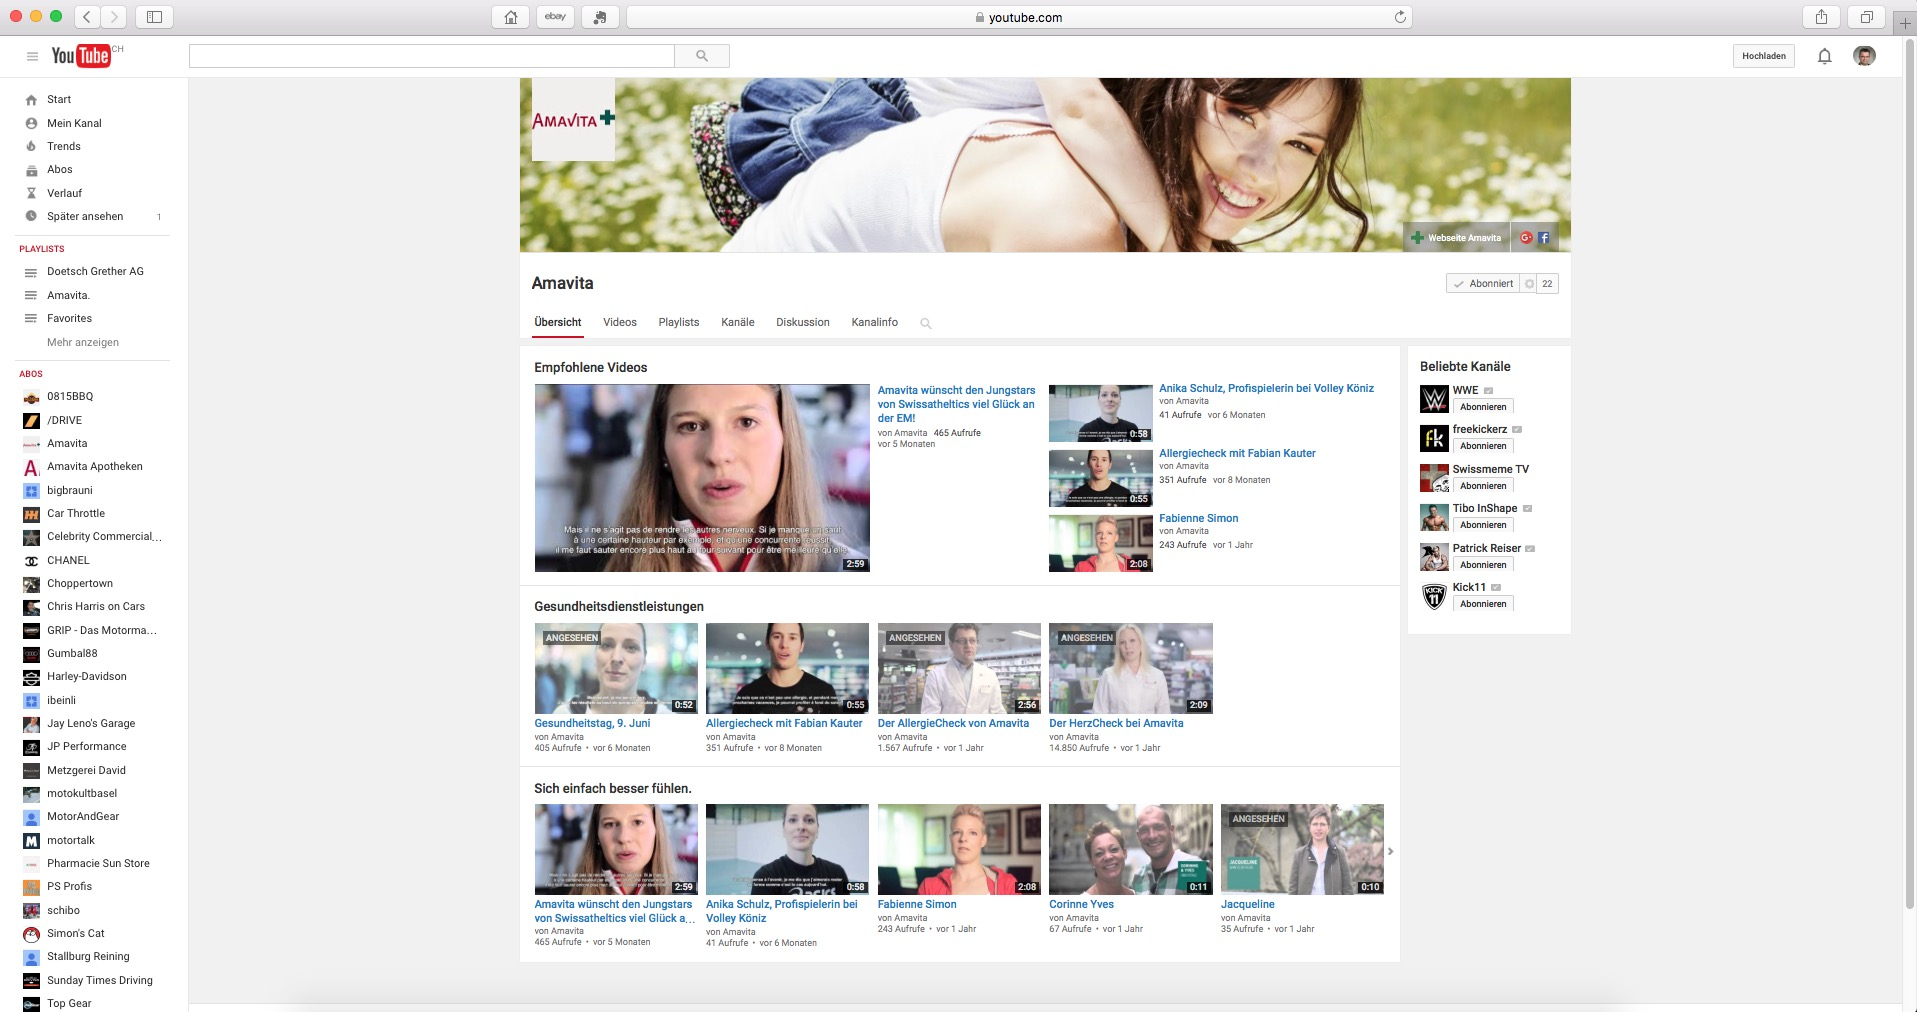 Amavita youtube 2015